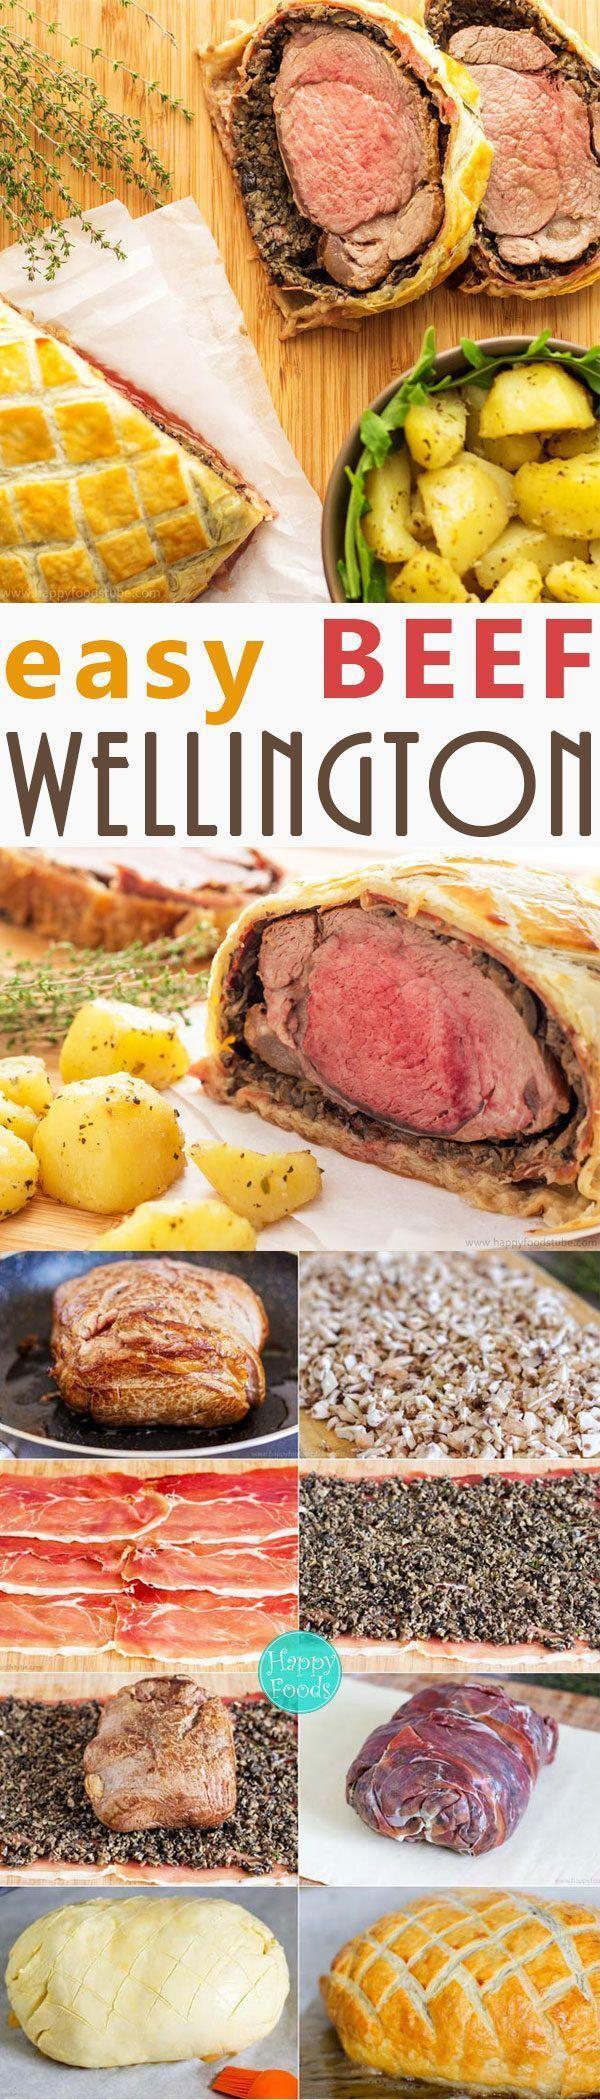 Easy Beef Wellington with Mushroom & Jam�n - Fine Dining, Classical British Food, Home Cooking, Best Beef Wellington, Recipe   happyfoodstube.com